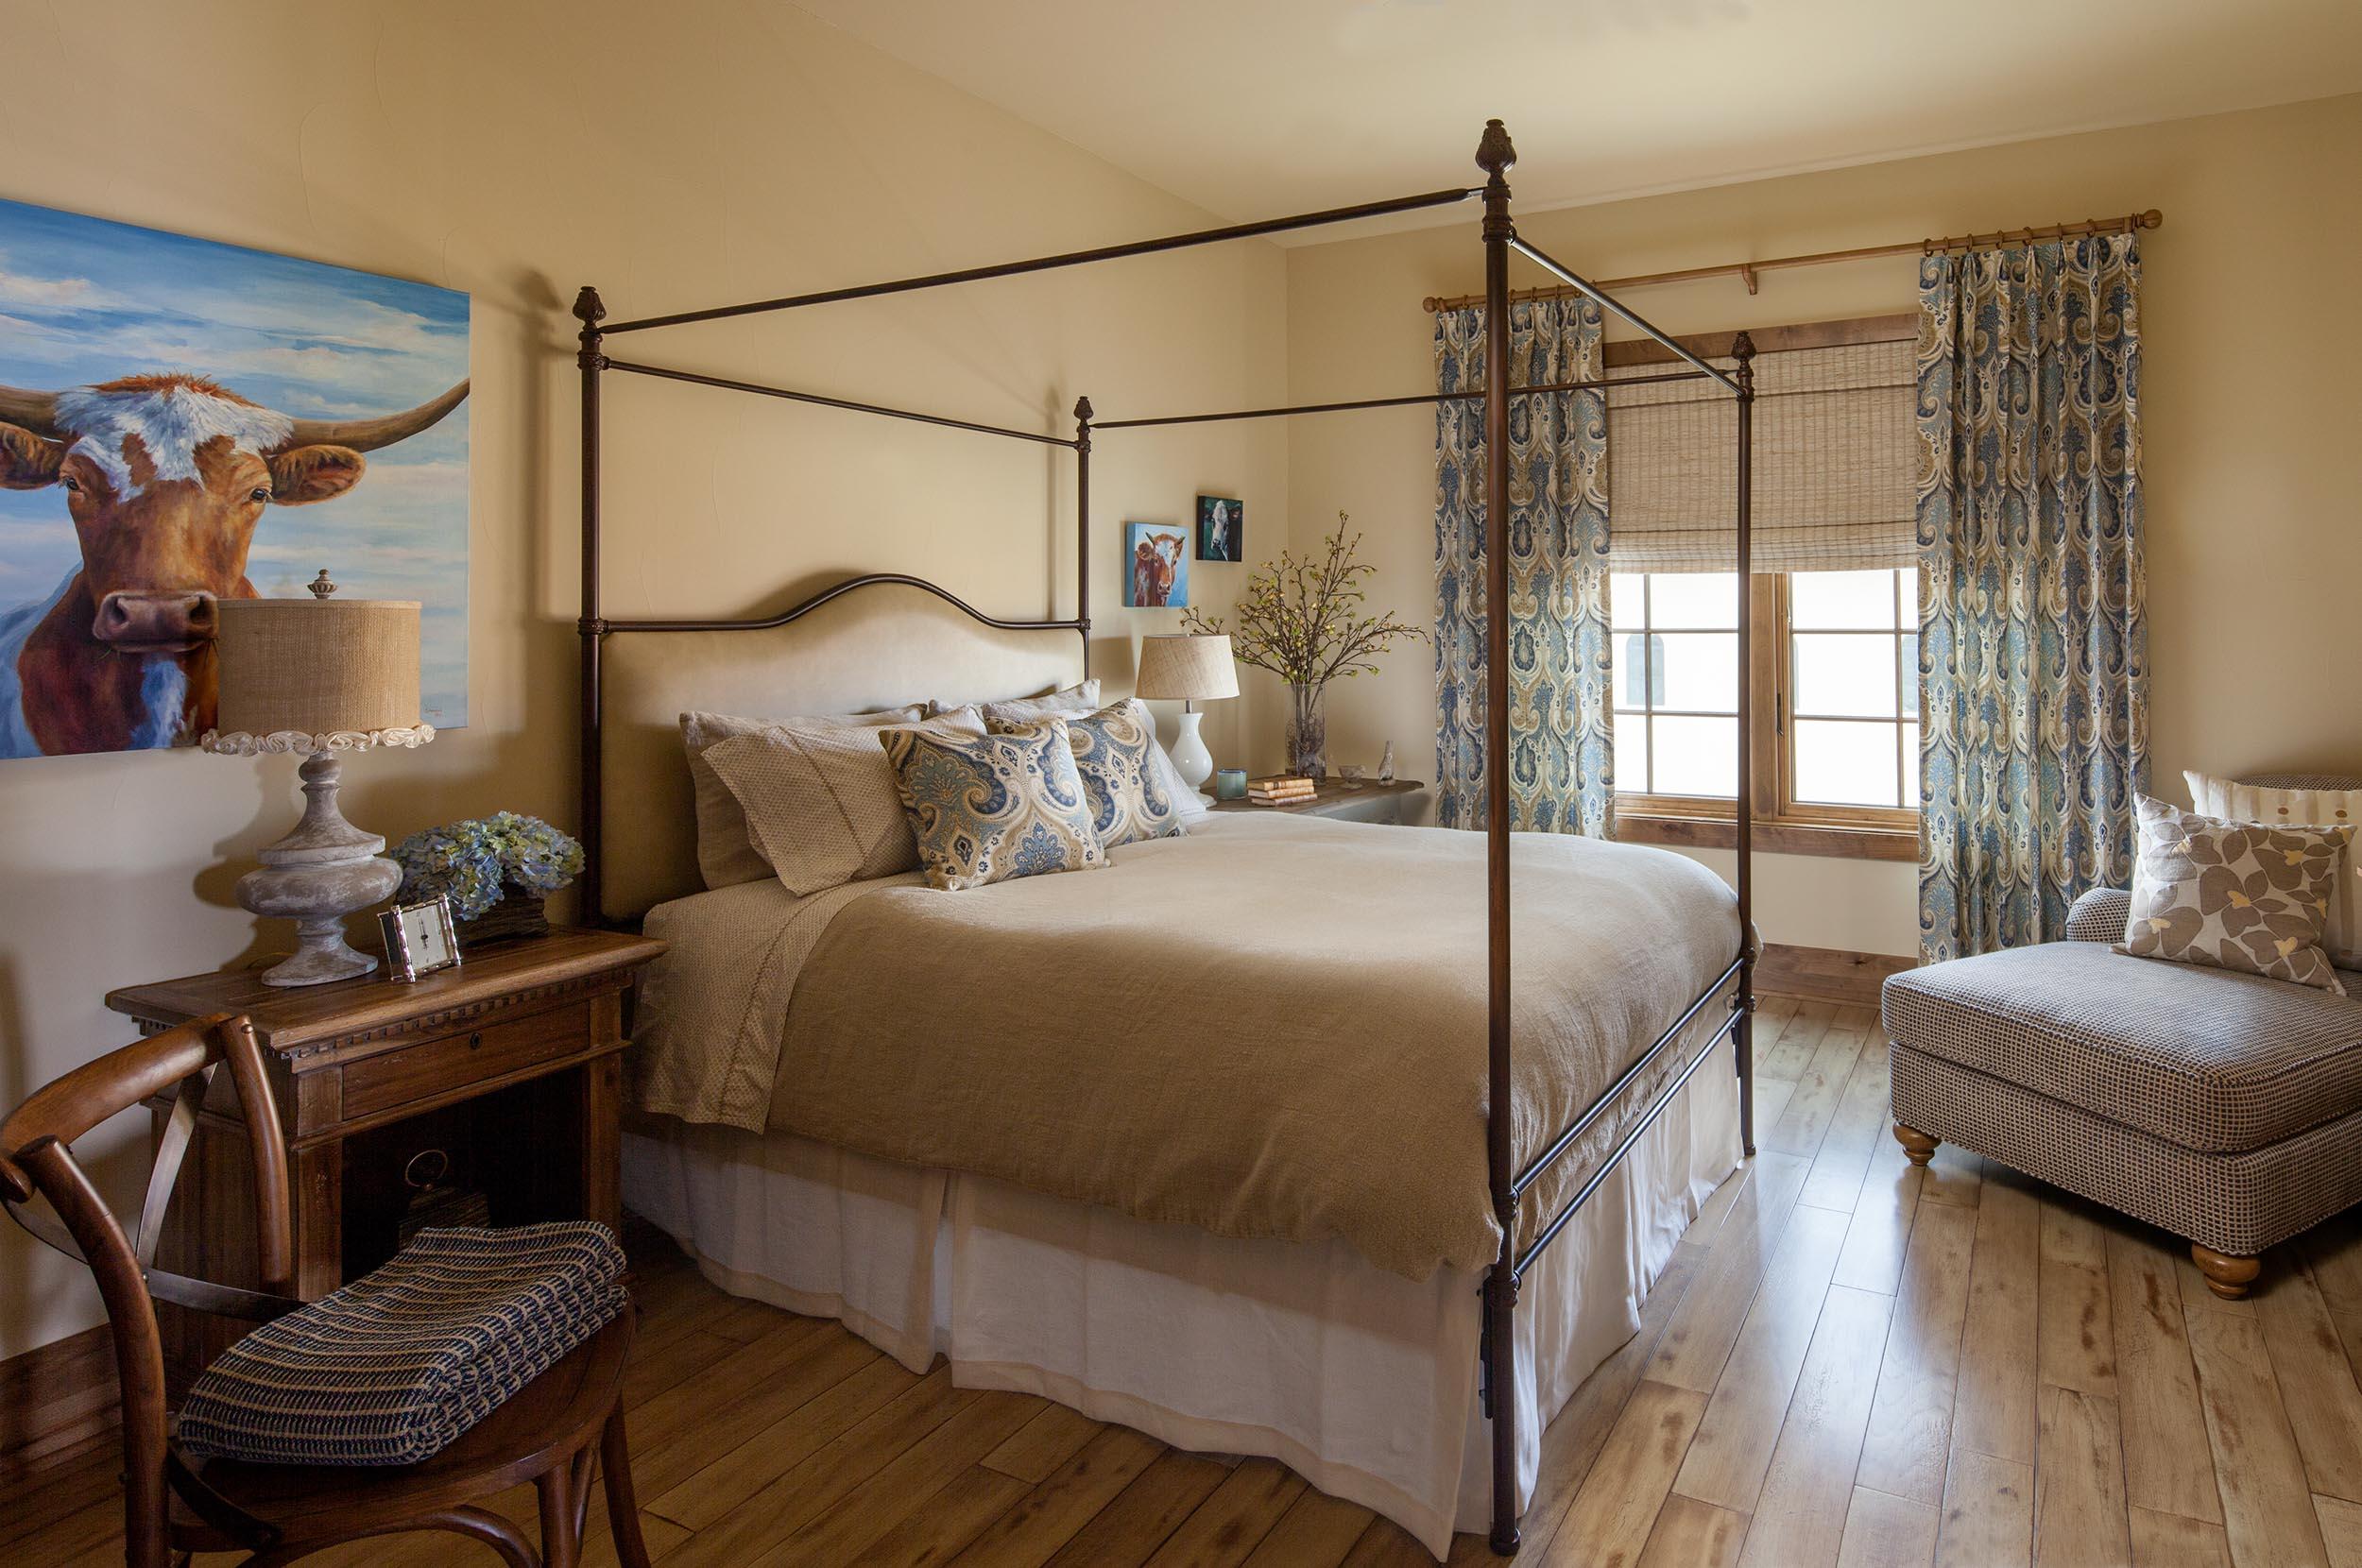 austin-house-guest-bedroom-interior-design.jpg